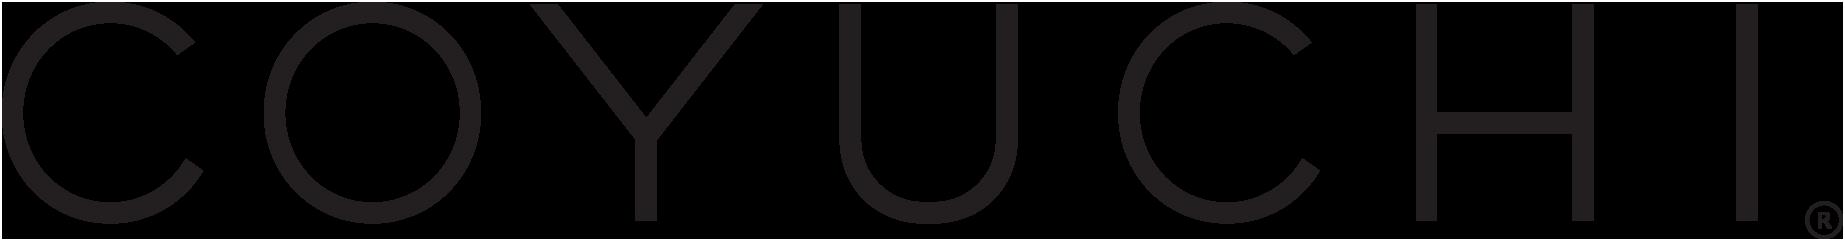 COYUCHI-logo-black.png